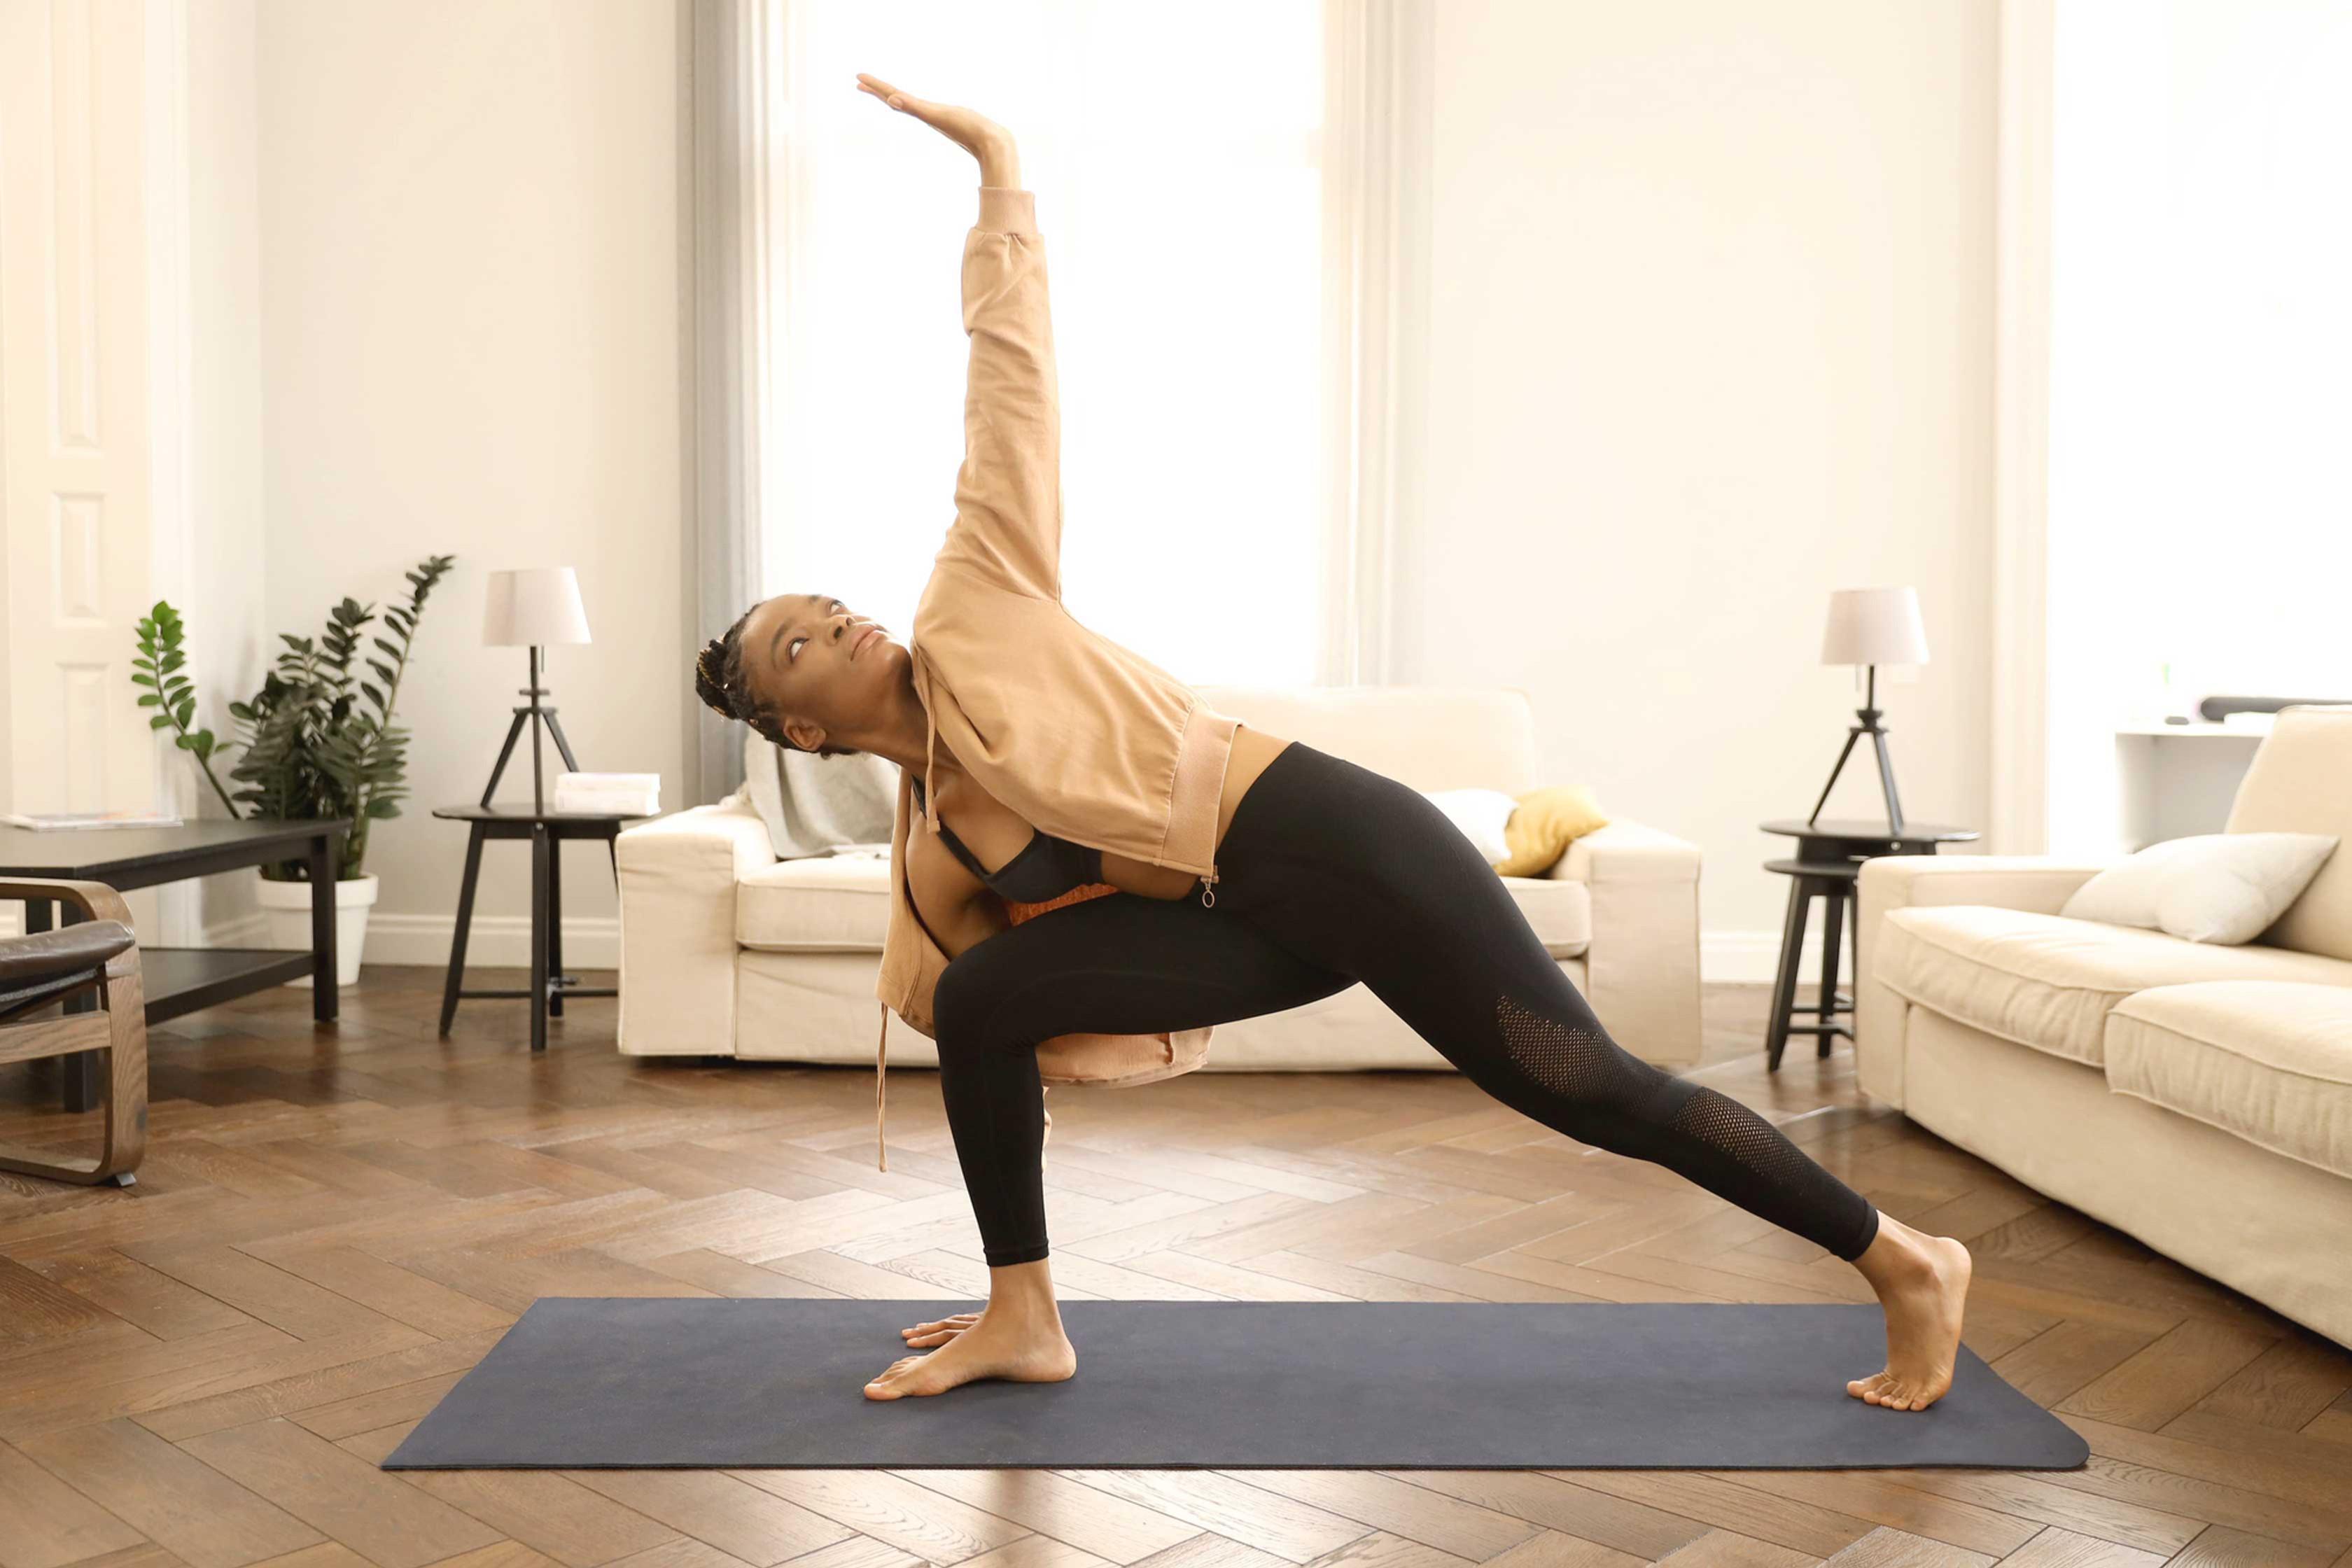 Kripalu Yoga at Home on Thursdays